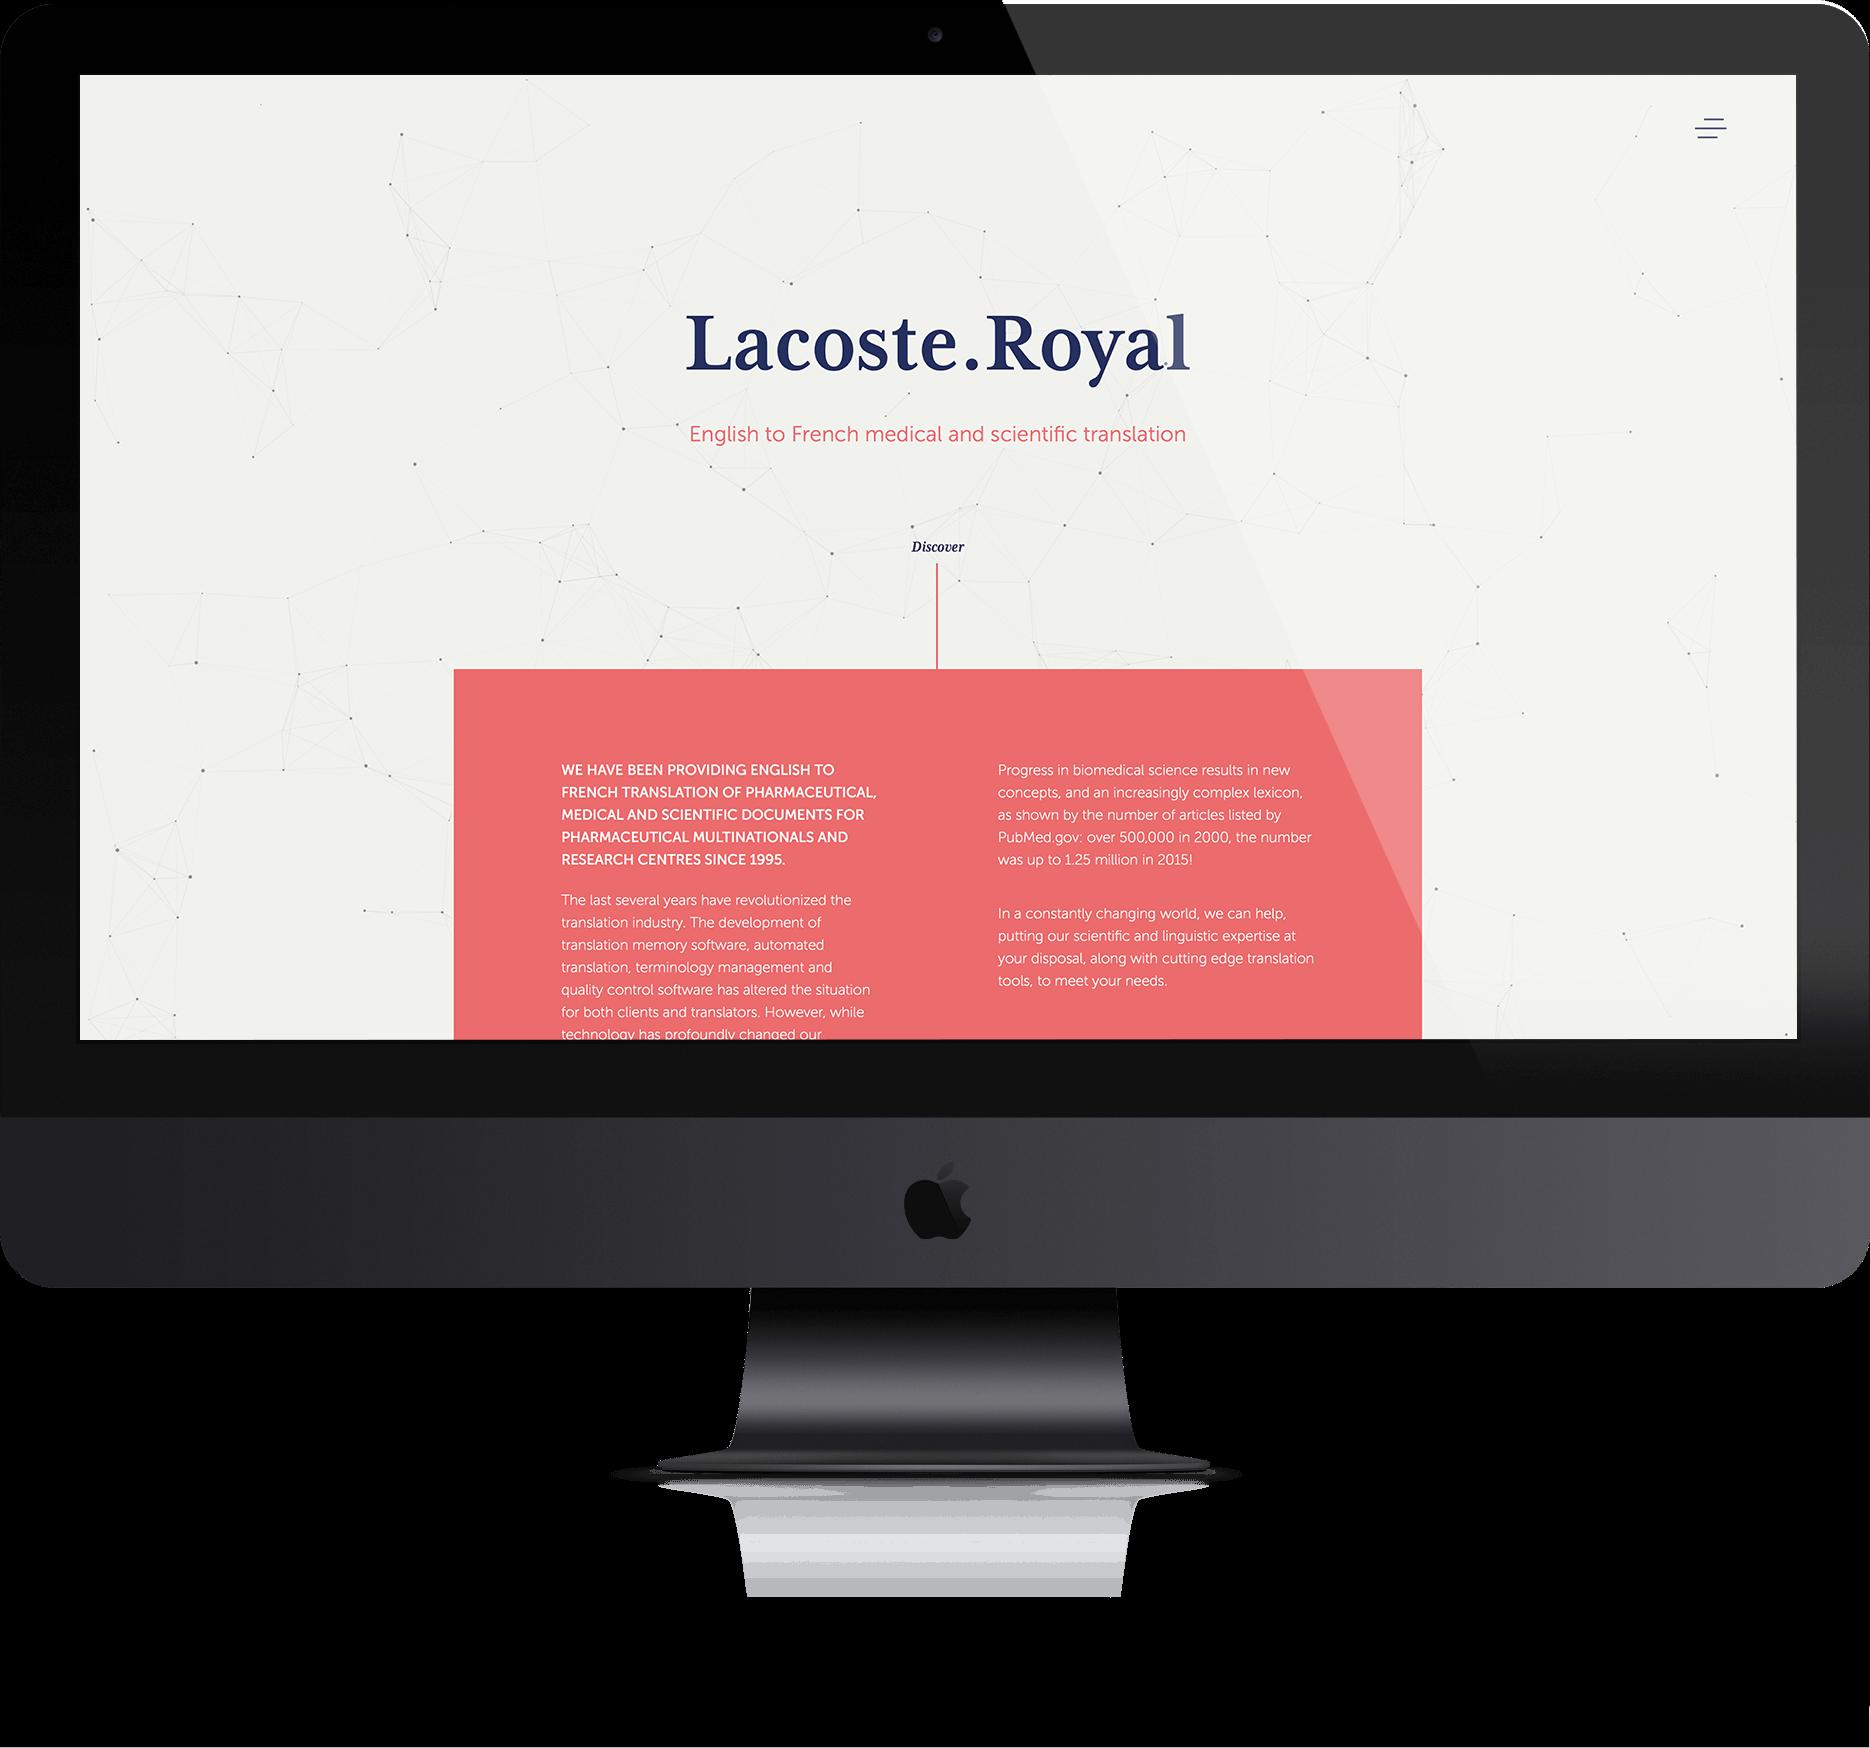 Lacoste Royal